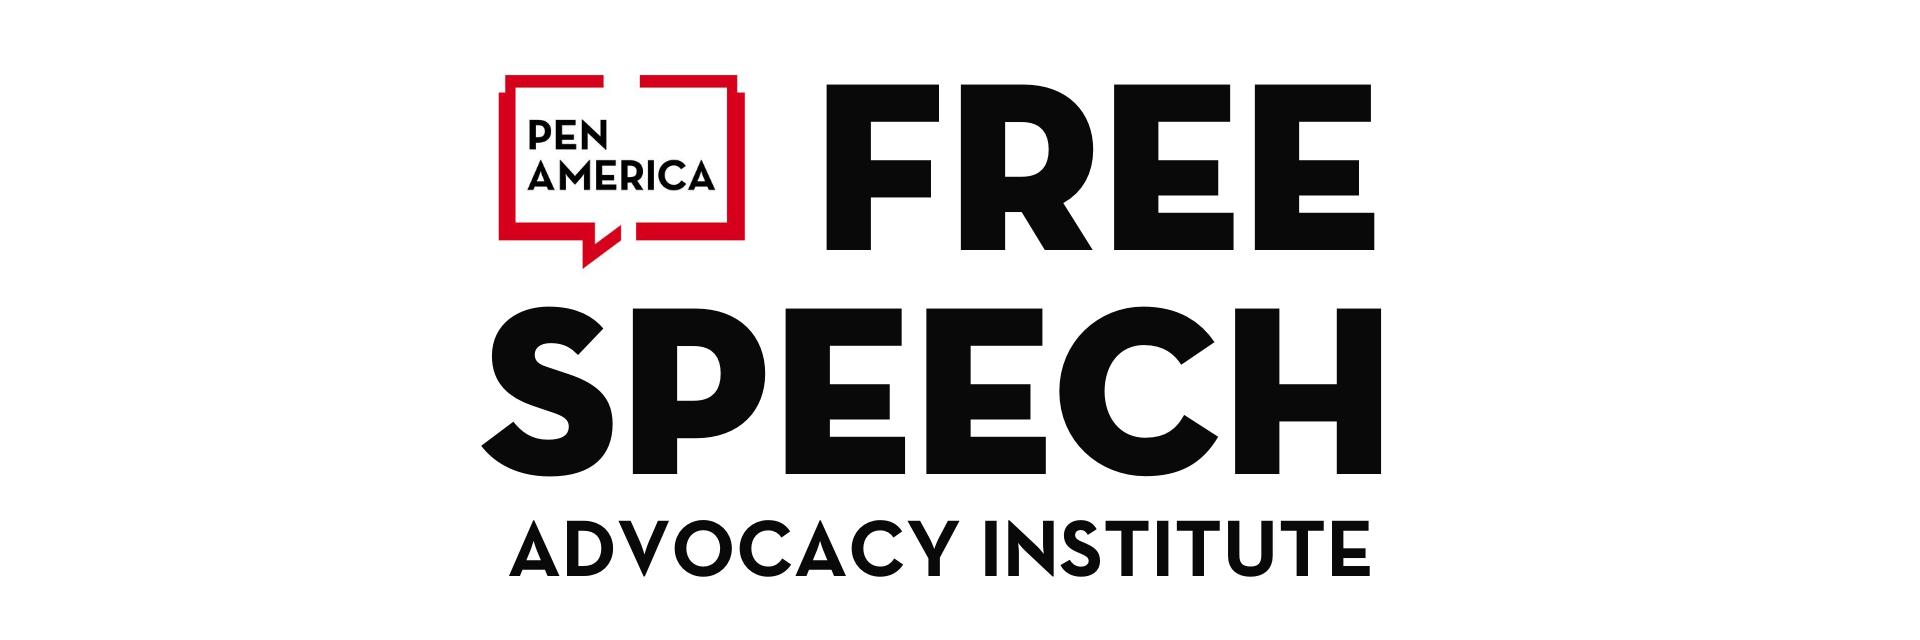 PEN America Free Speech Advocacy Institute Hero Graphic